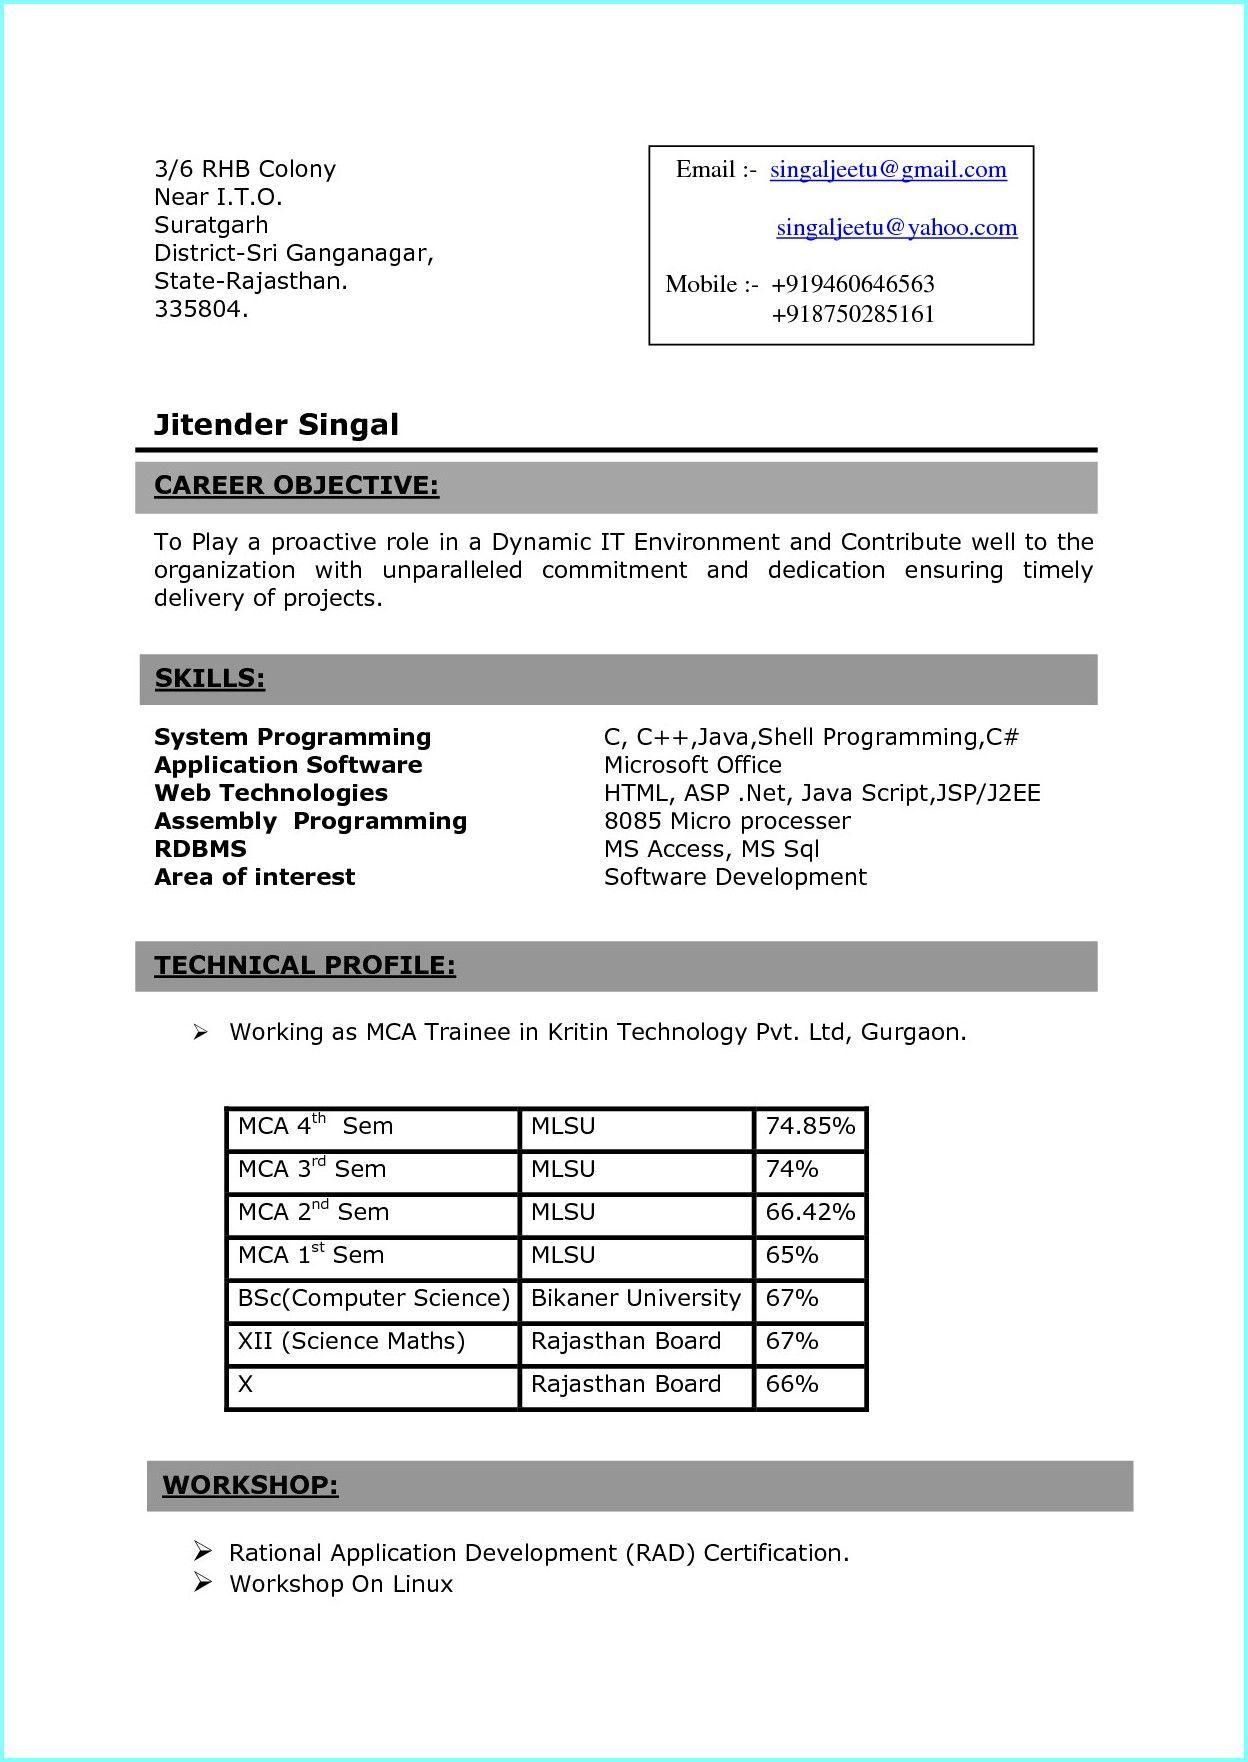 Sample Resume For Freshers Pdf